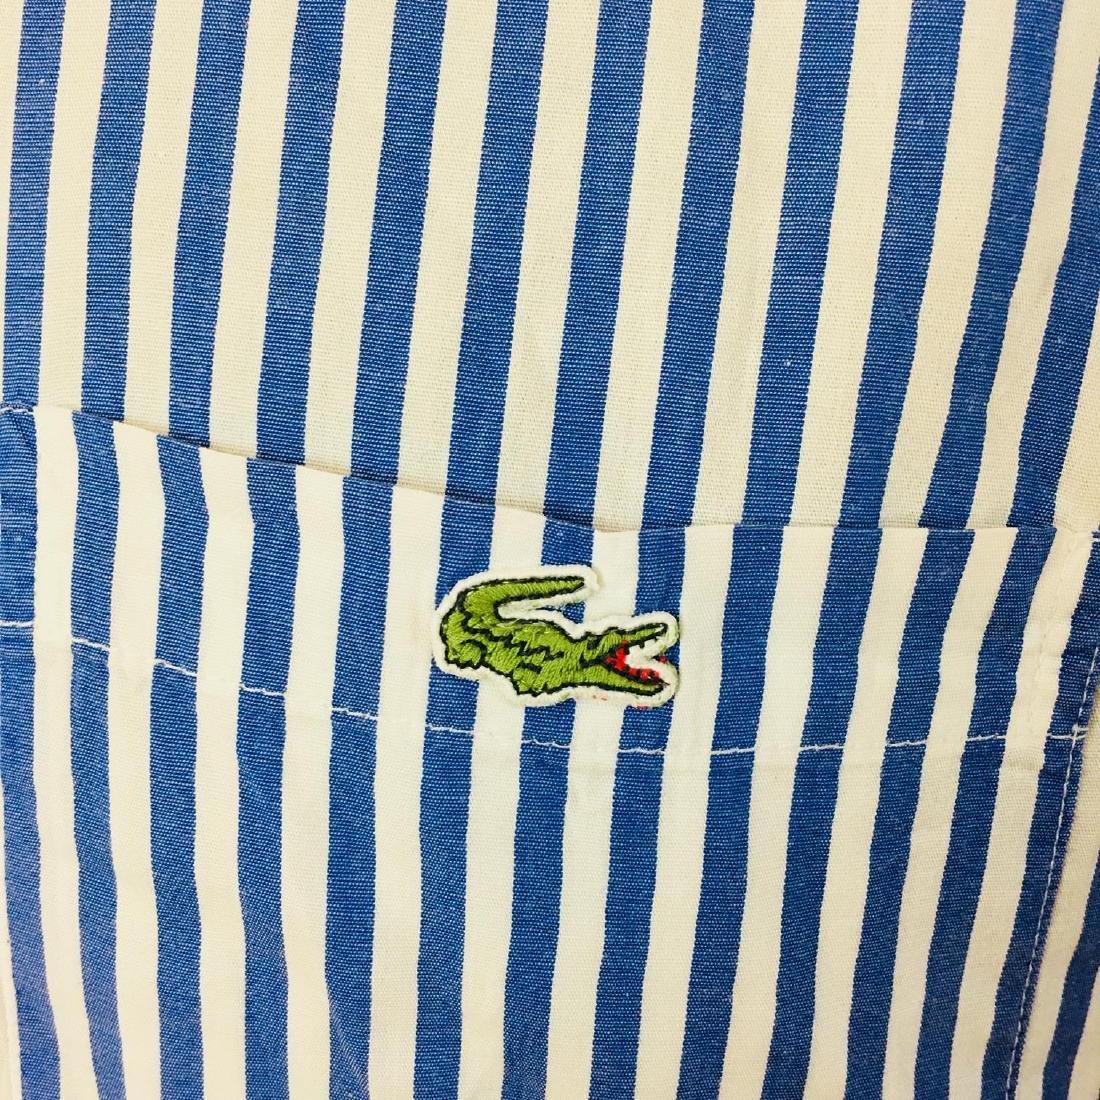 Men's Lacoste Blue Striped Short Sleeve Shirt Size 39 / - 2